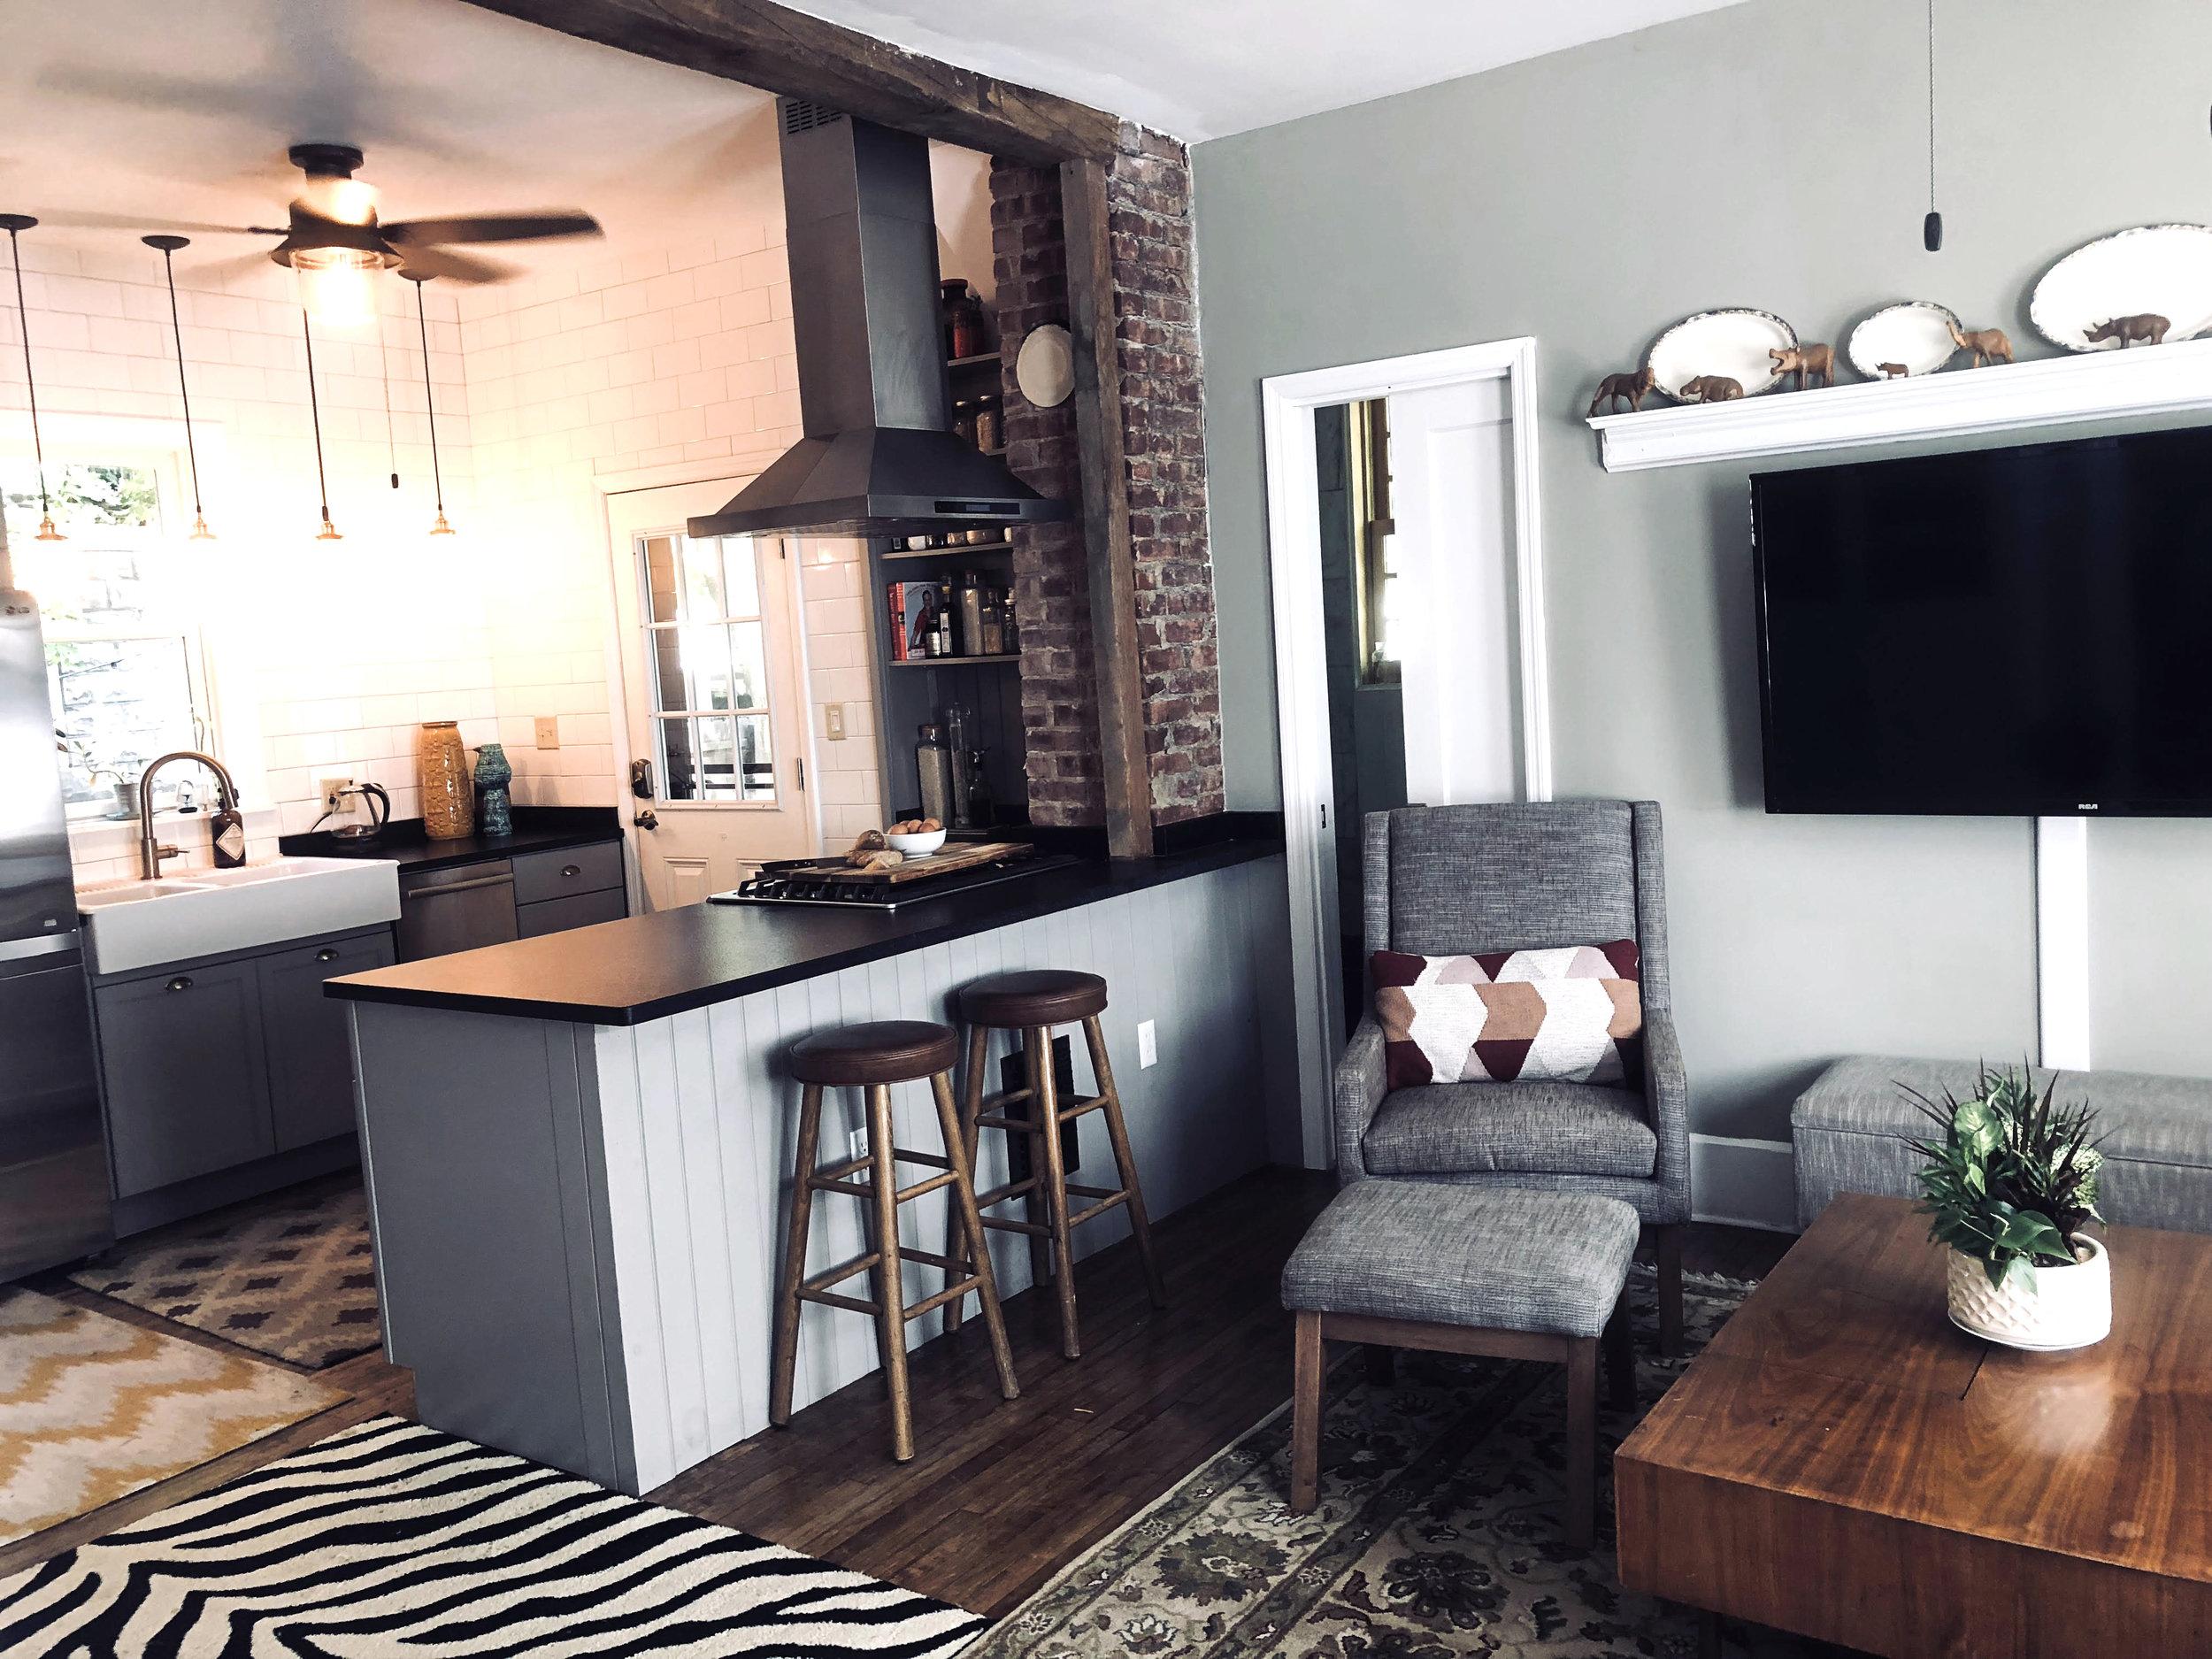 livingroomkitchen.jpg